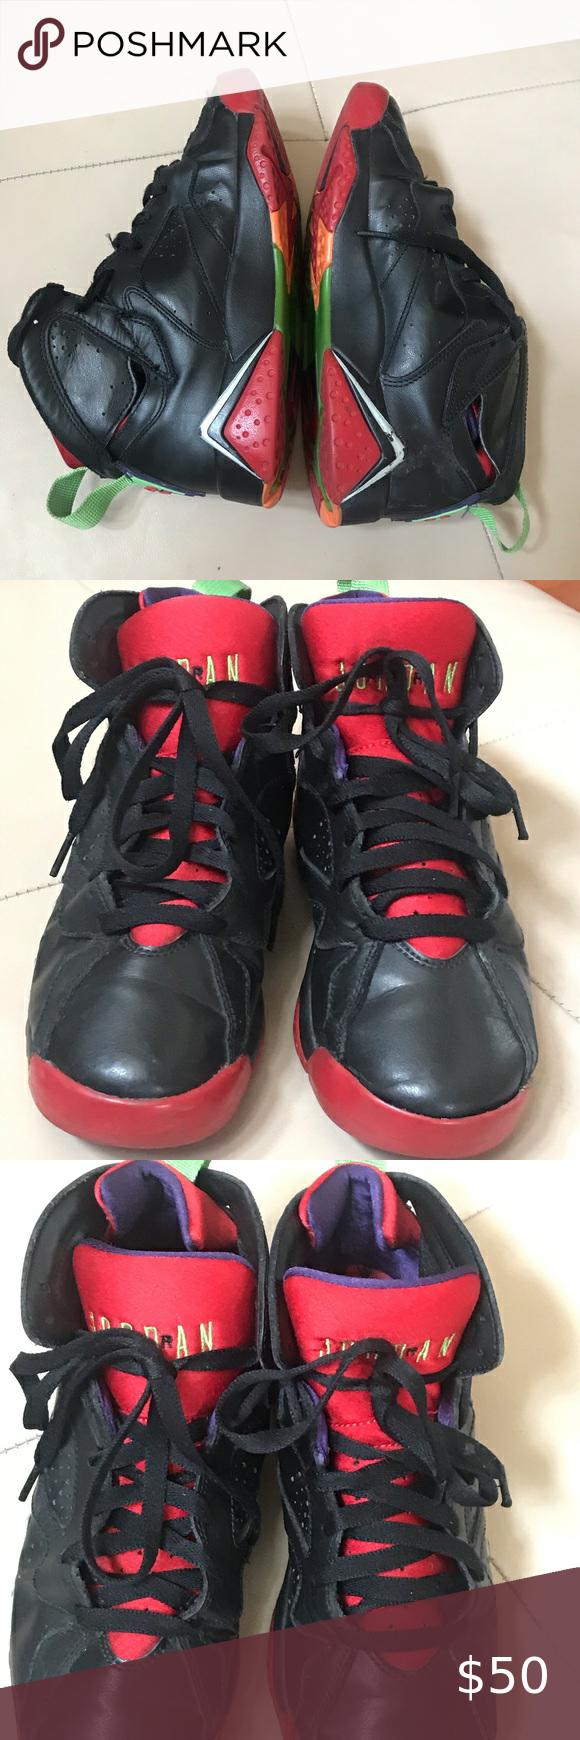 Jordan 7 Retro Shoes, Youth Size 6Y in 2020 Retro shoes